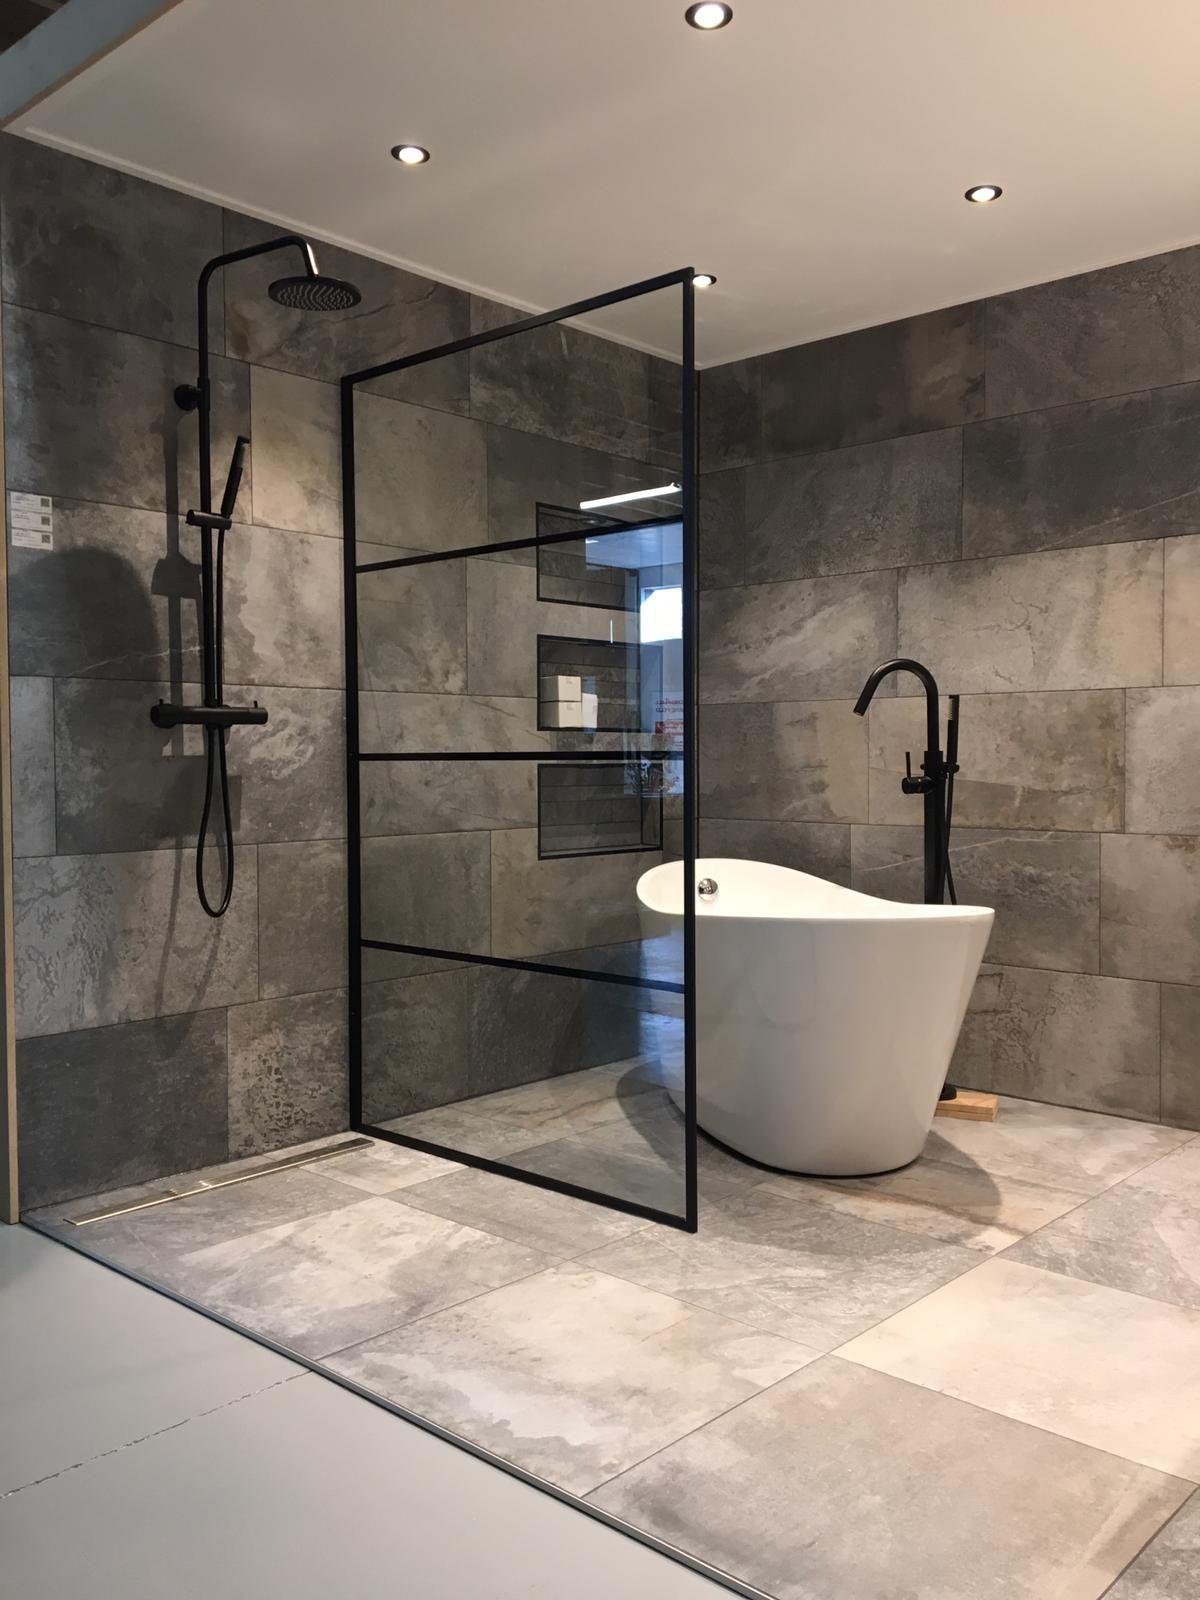 Sulky Rayon 40wt Thread 250yd Joann In 2021 Concrete Bathroom Design Concrete Bathroom Bathroom Interior